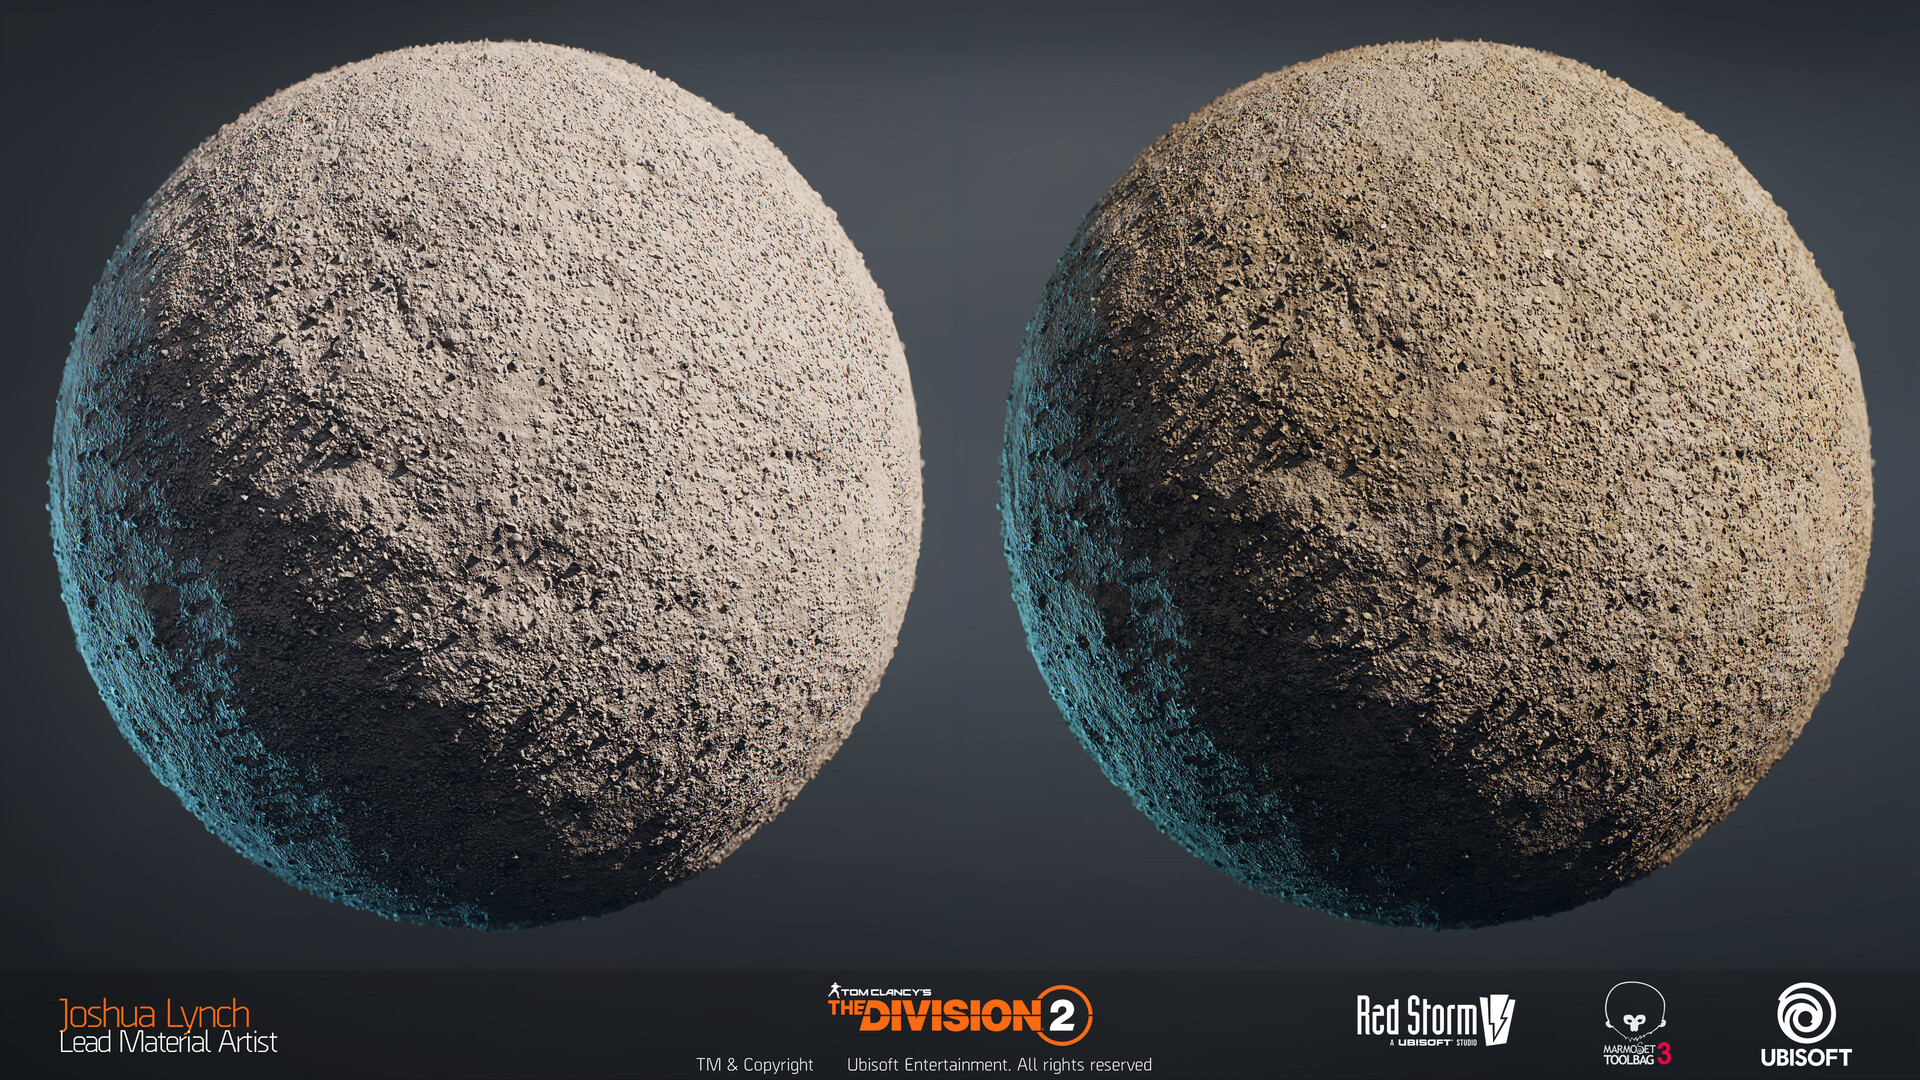 Joshua lynch division 2 josh lynch soil gravel 02